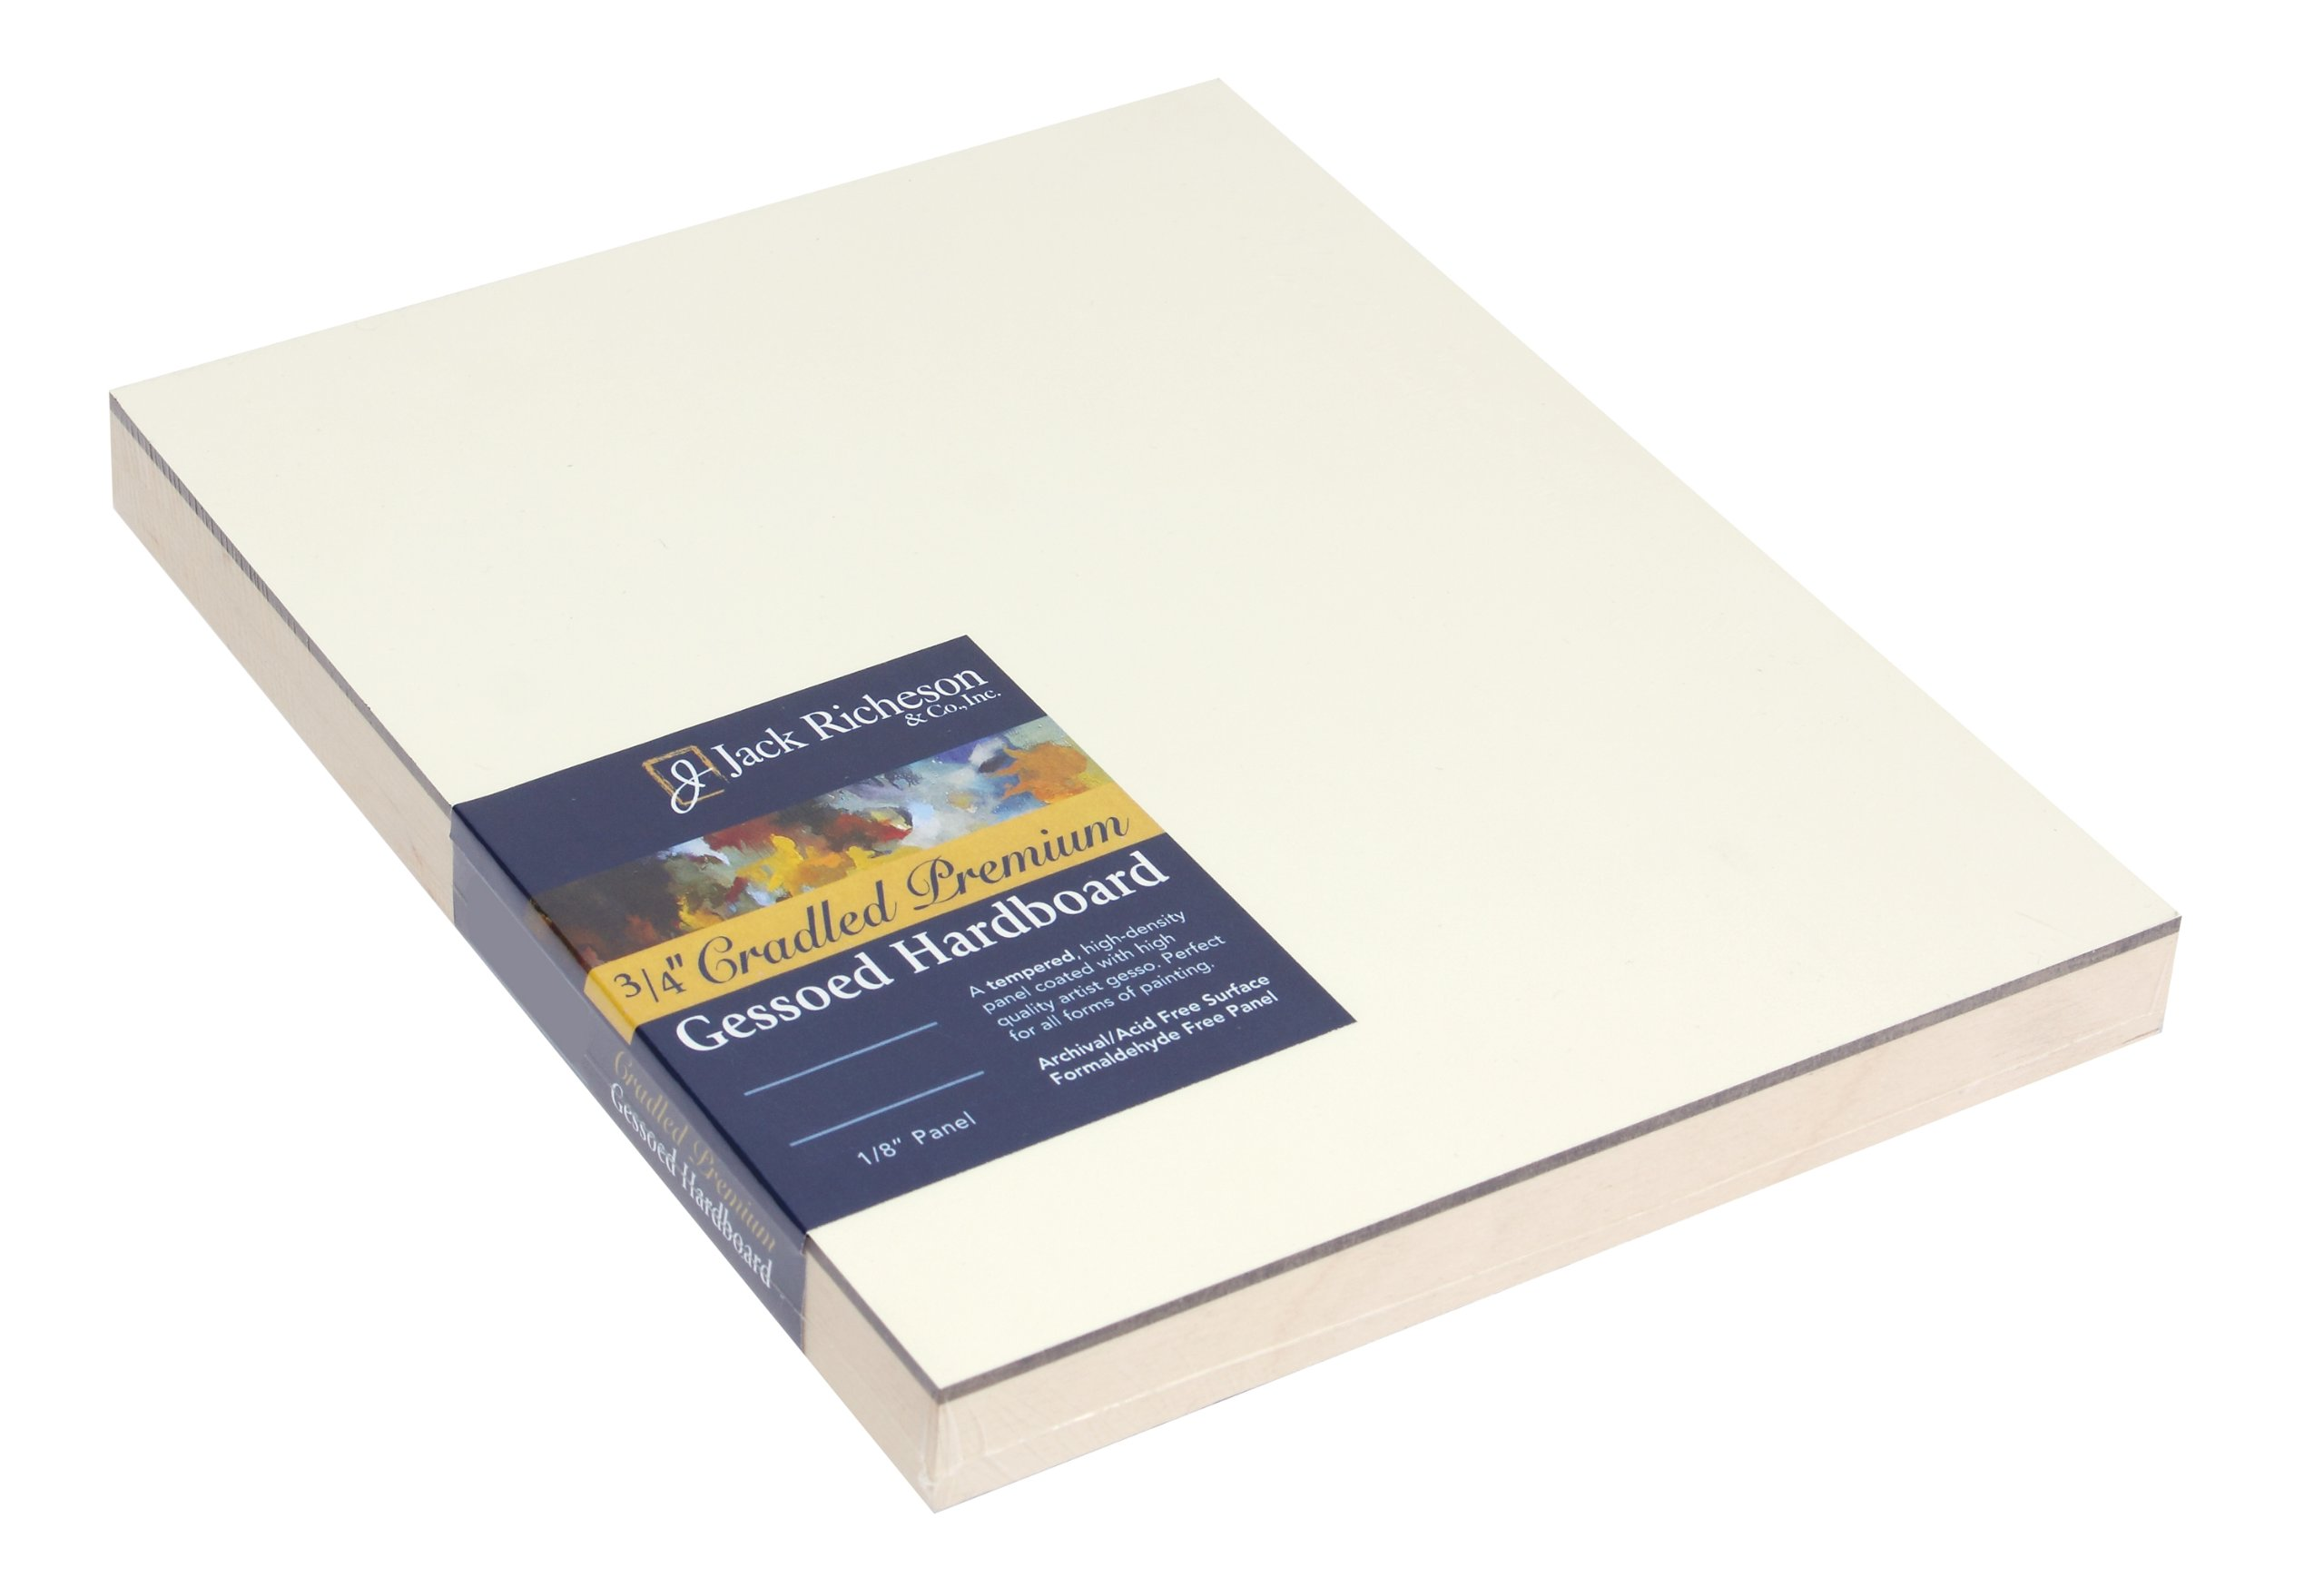 Jack Richeson 3/4-Inch Premium Tempered Gessoed Hardboard Panel, 6-Inch by 6-Inch by Jack Richeson